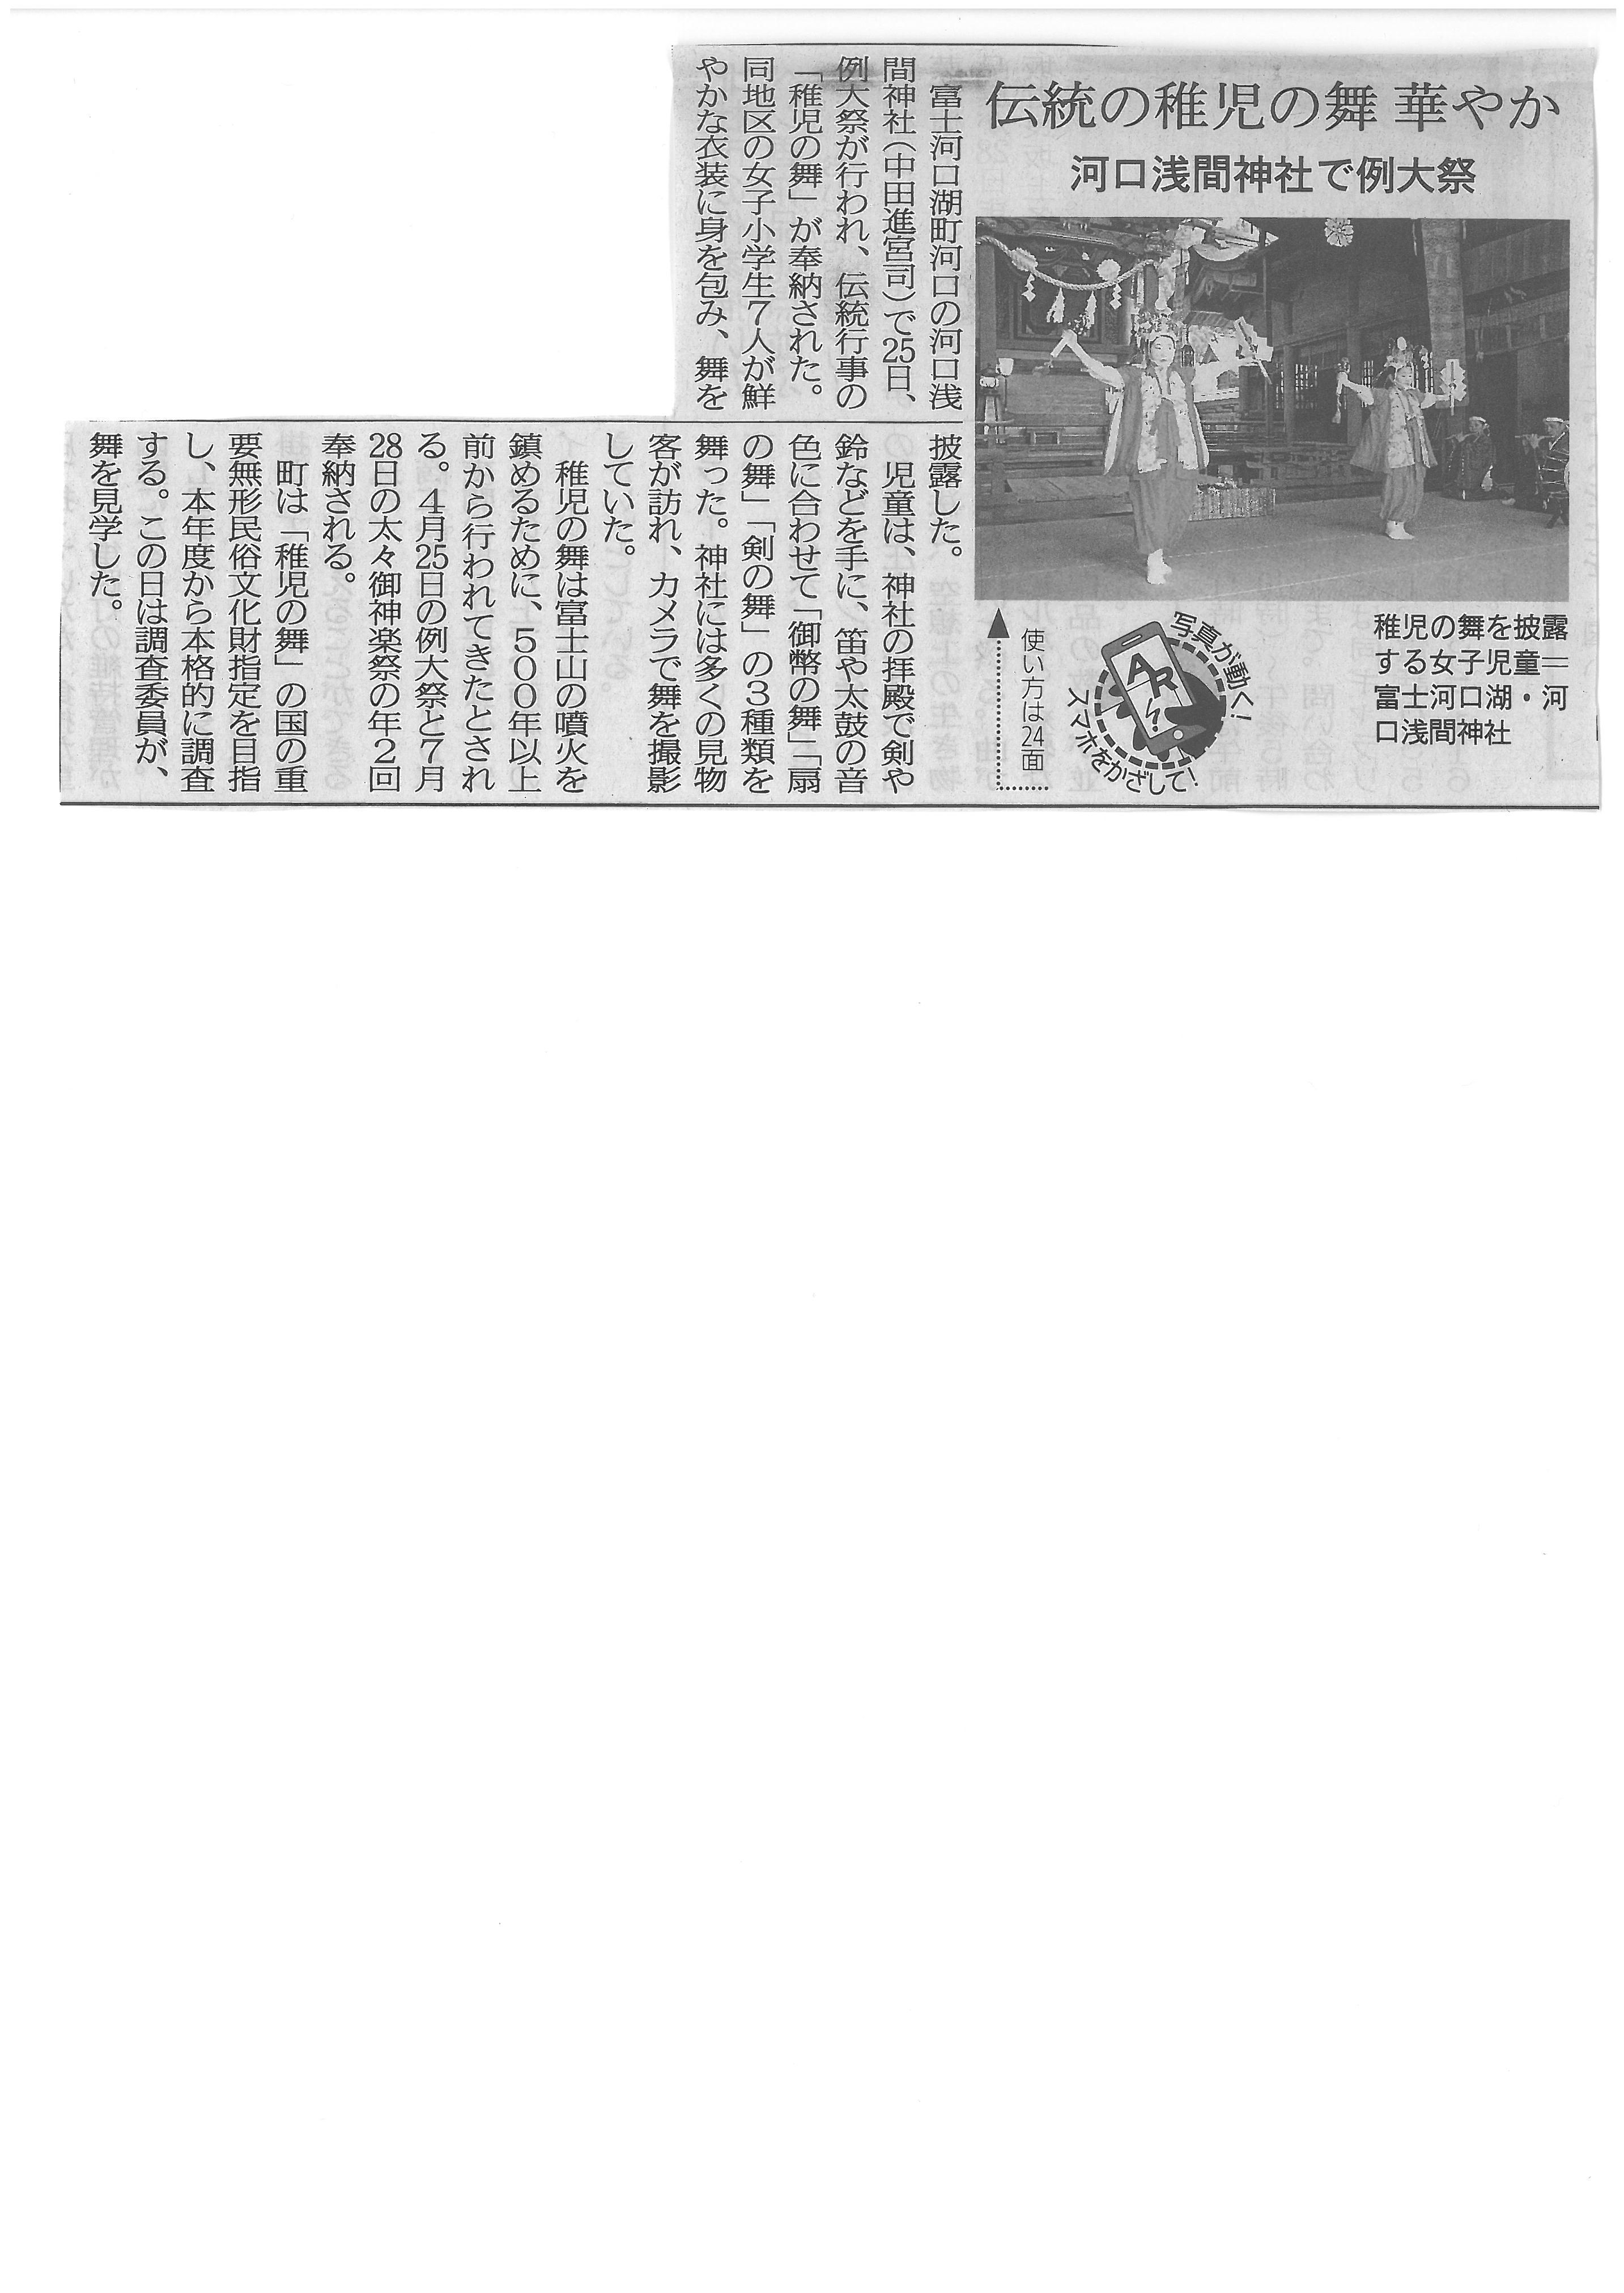 http://mtfuji.or.jp/img/media/_old/img/SKMBT_C22014042816450.jpg